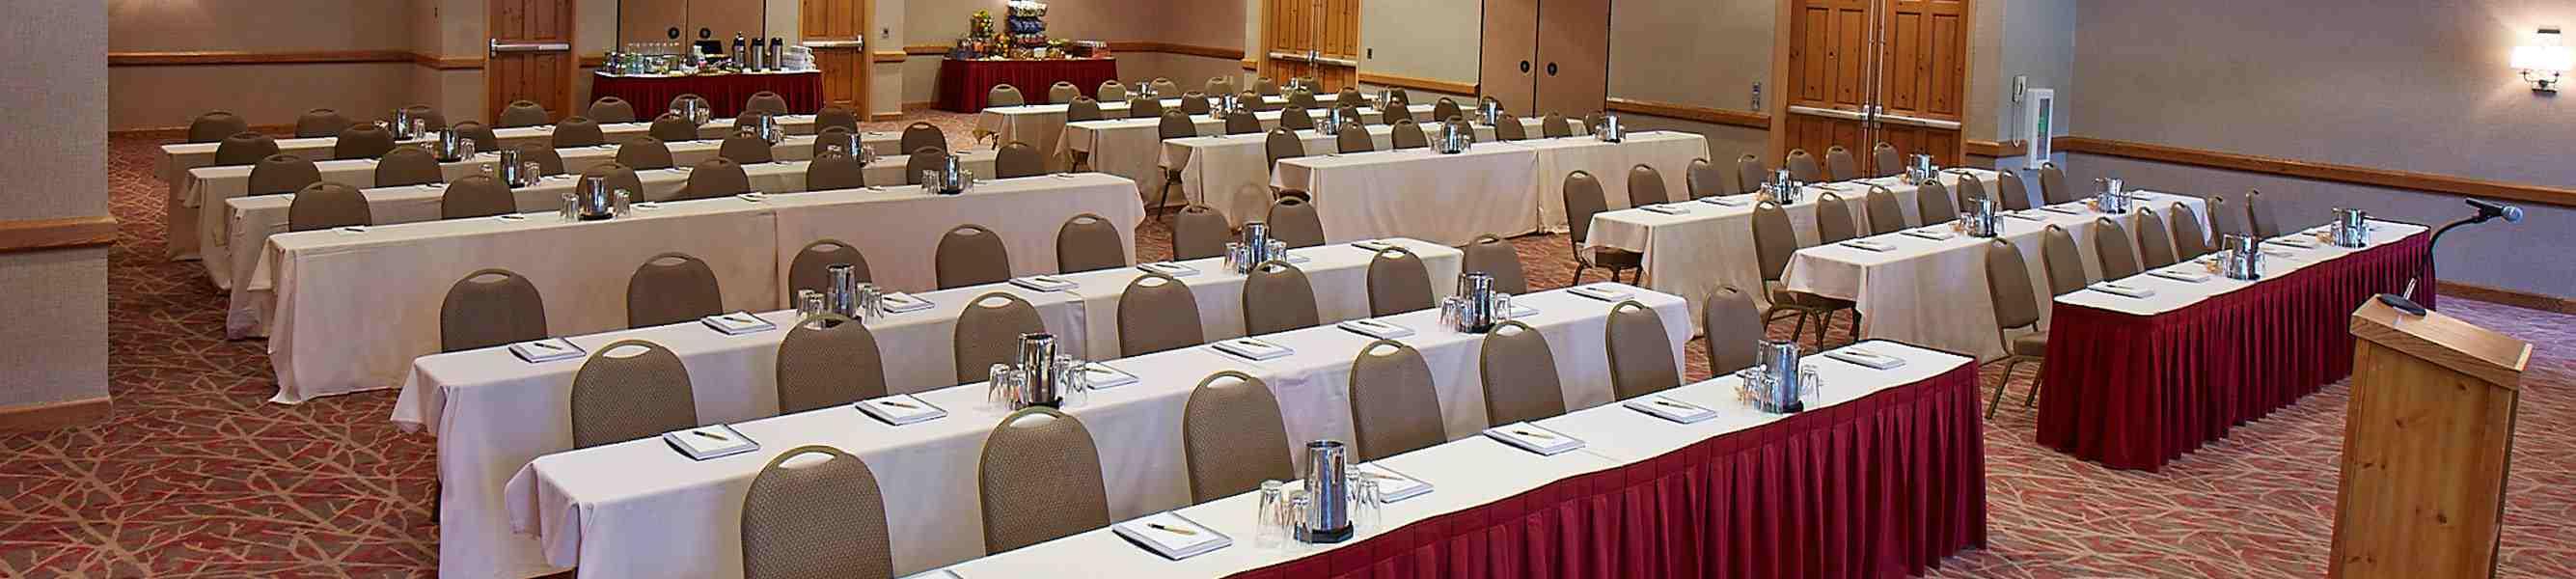 Cascasdes Meeting Room